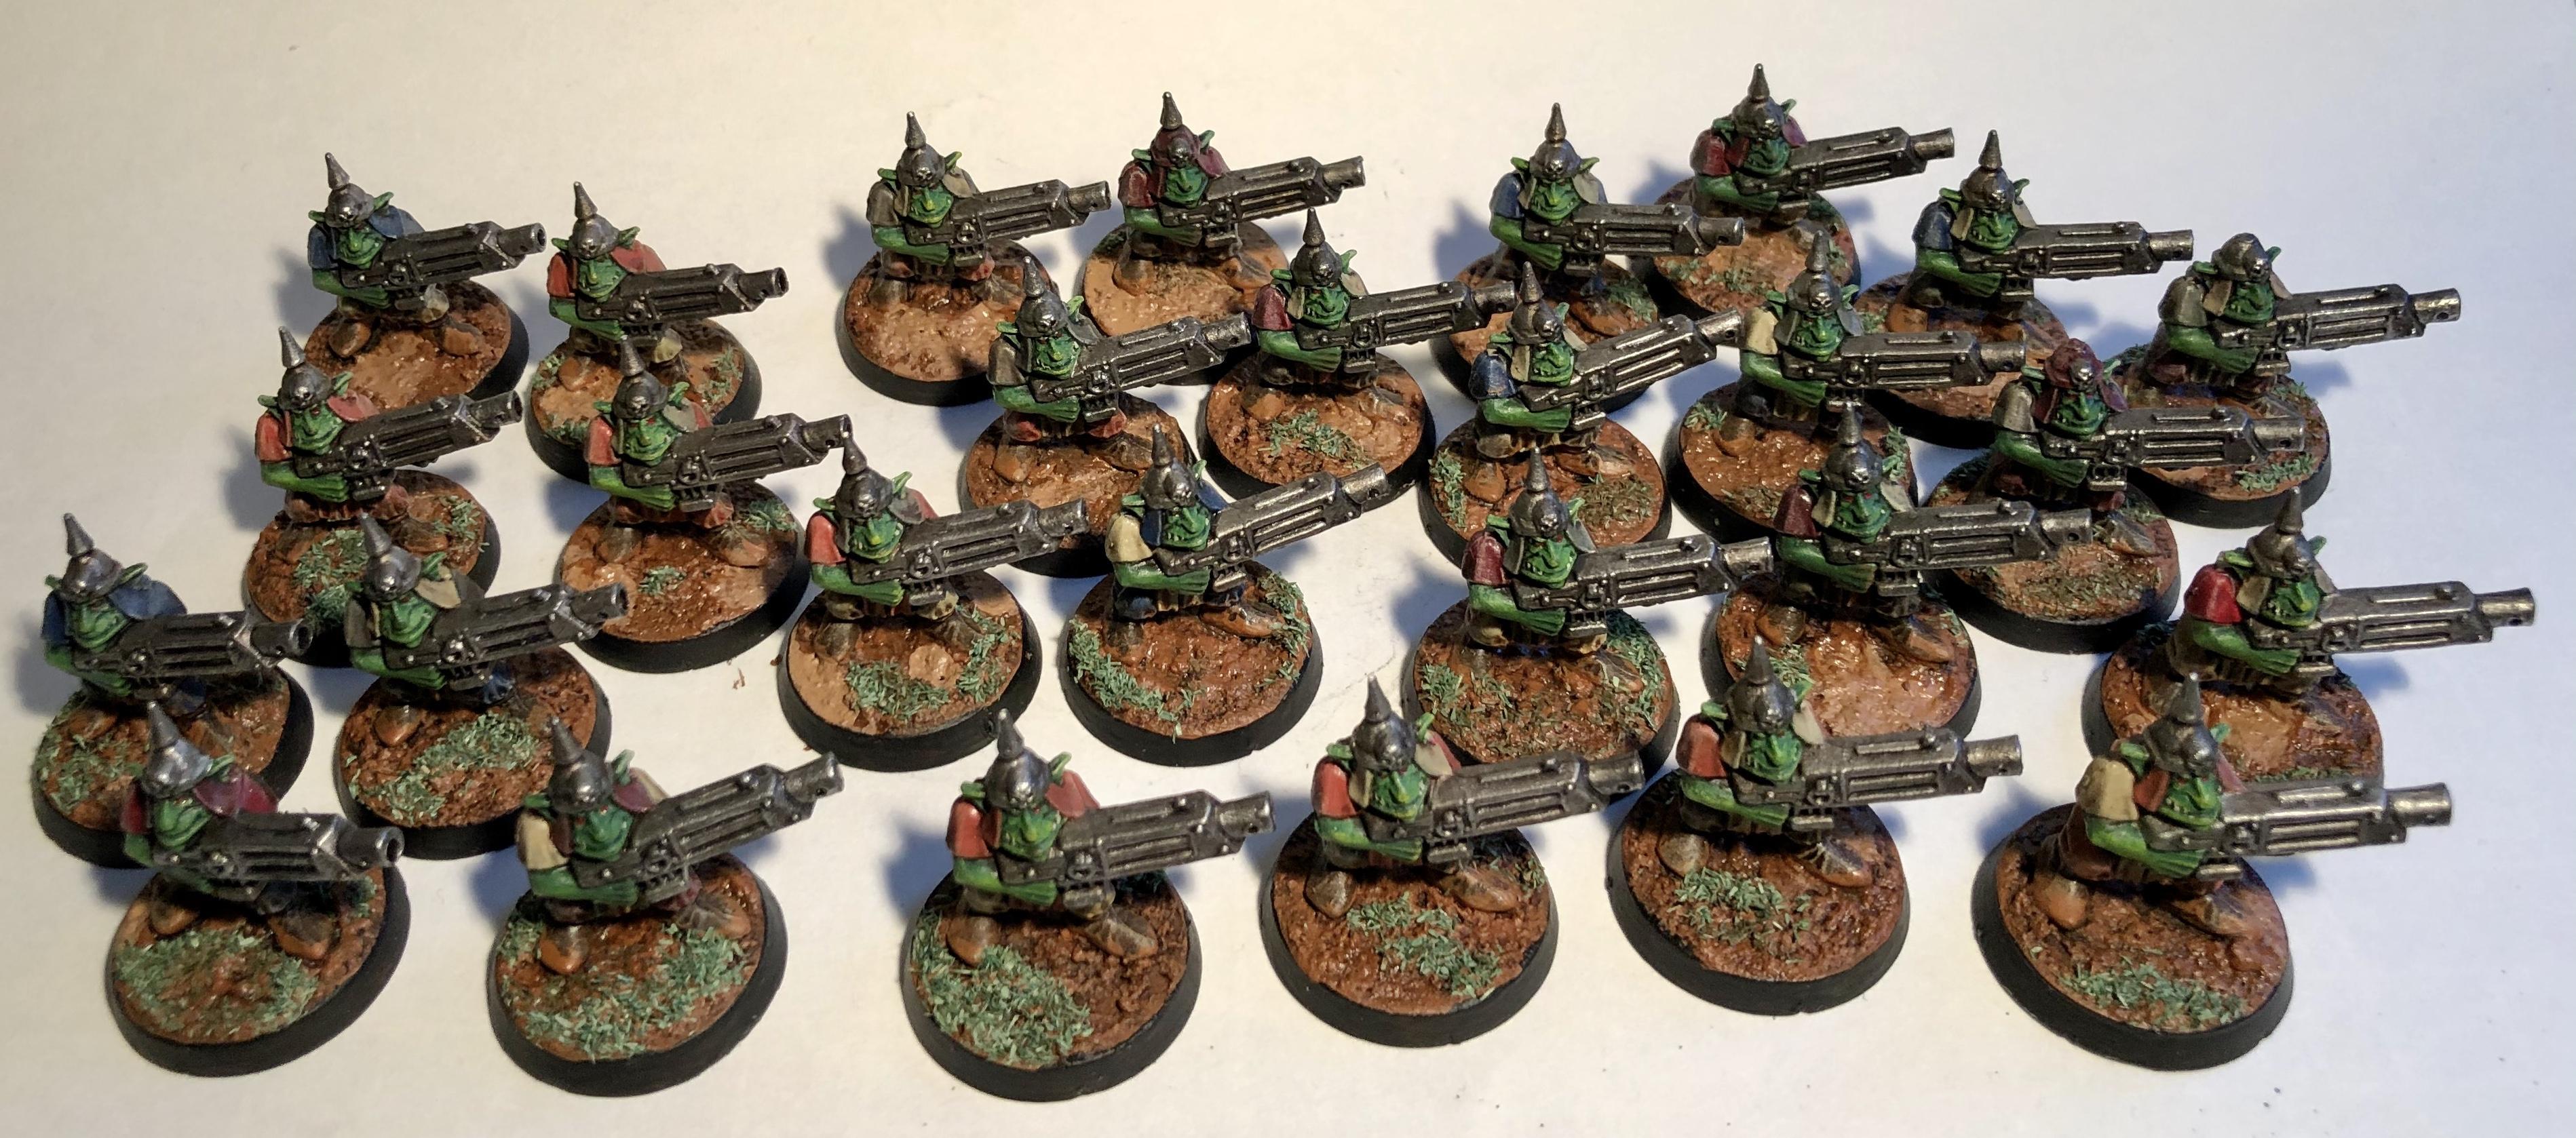 Drying Mud, Gretchin, Grots, Orks, Warhammer 40,000